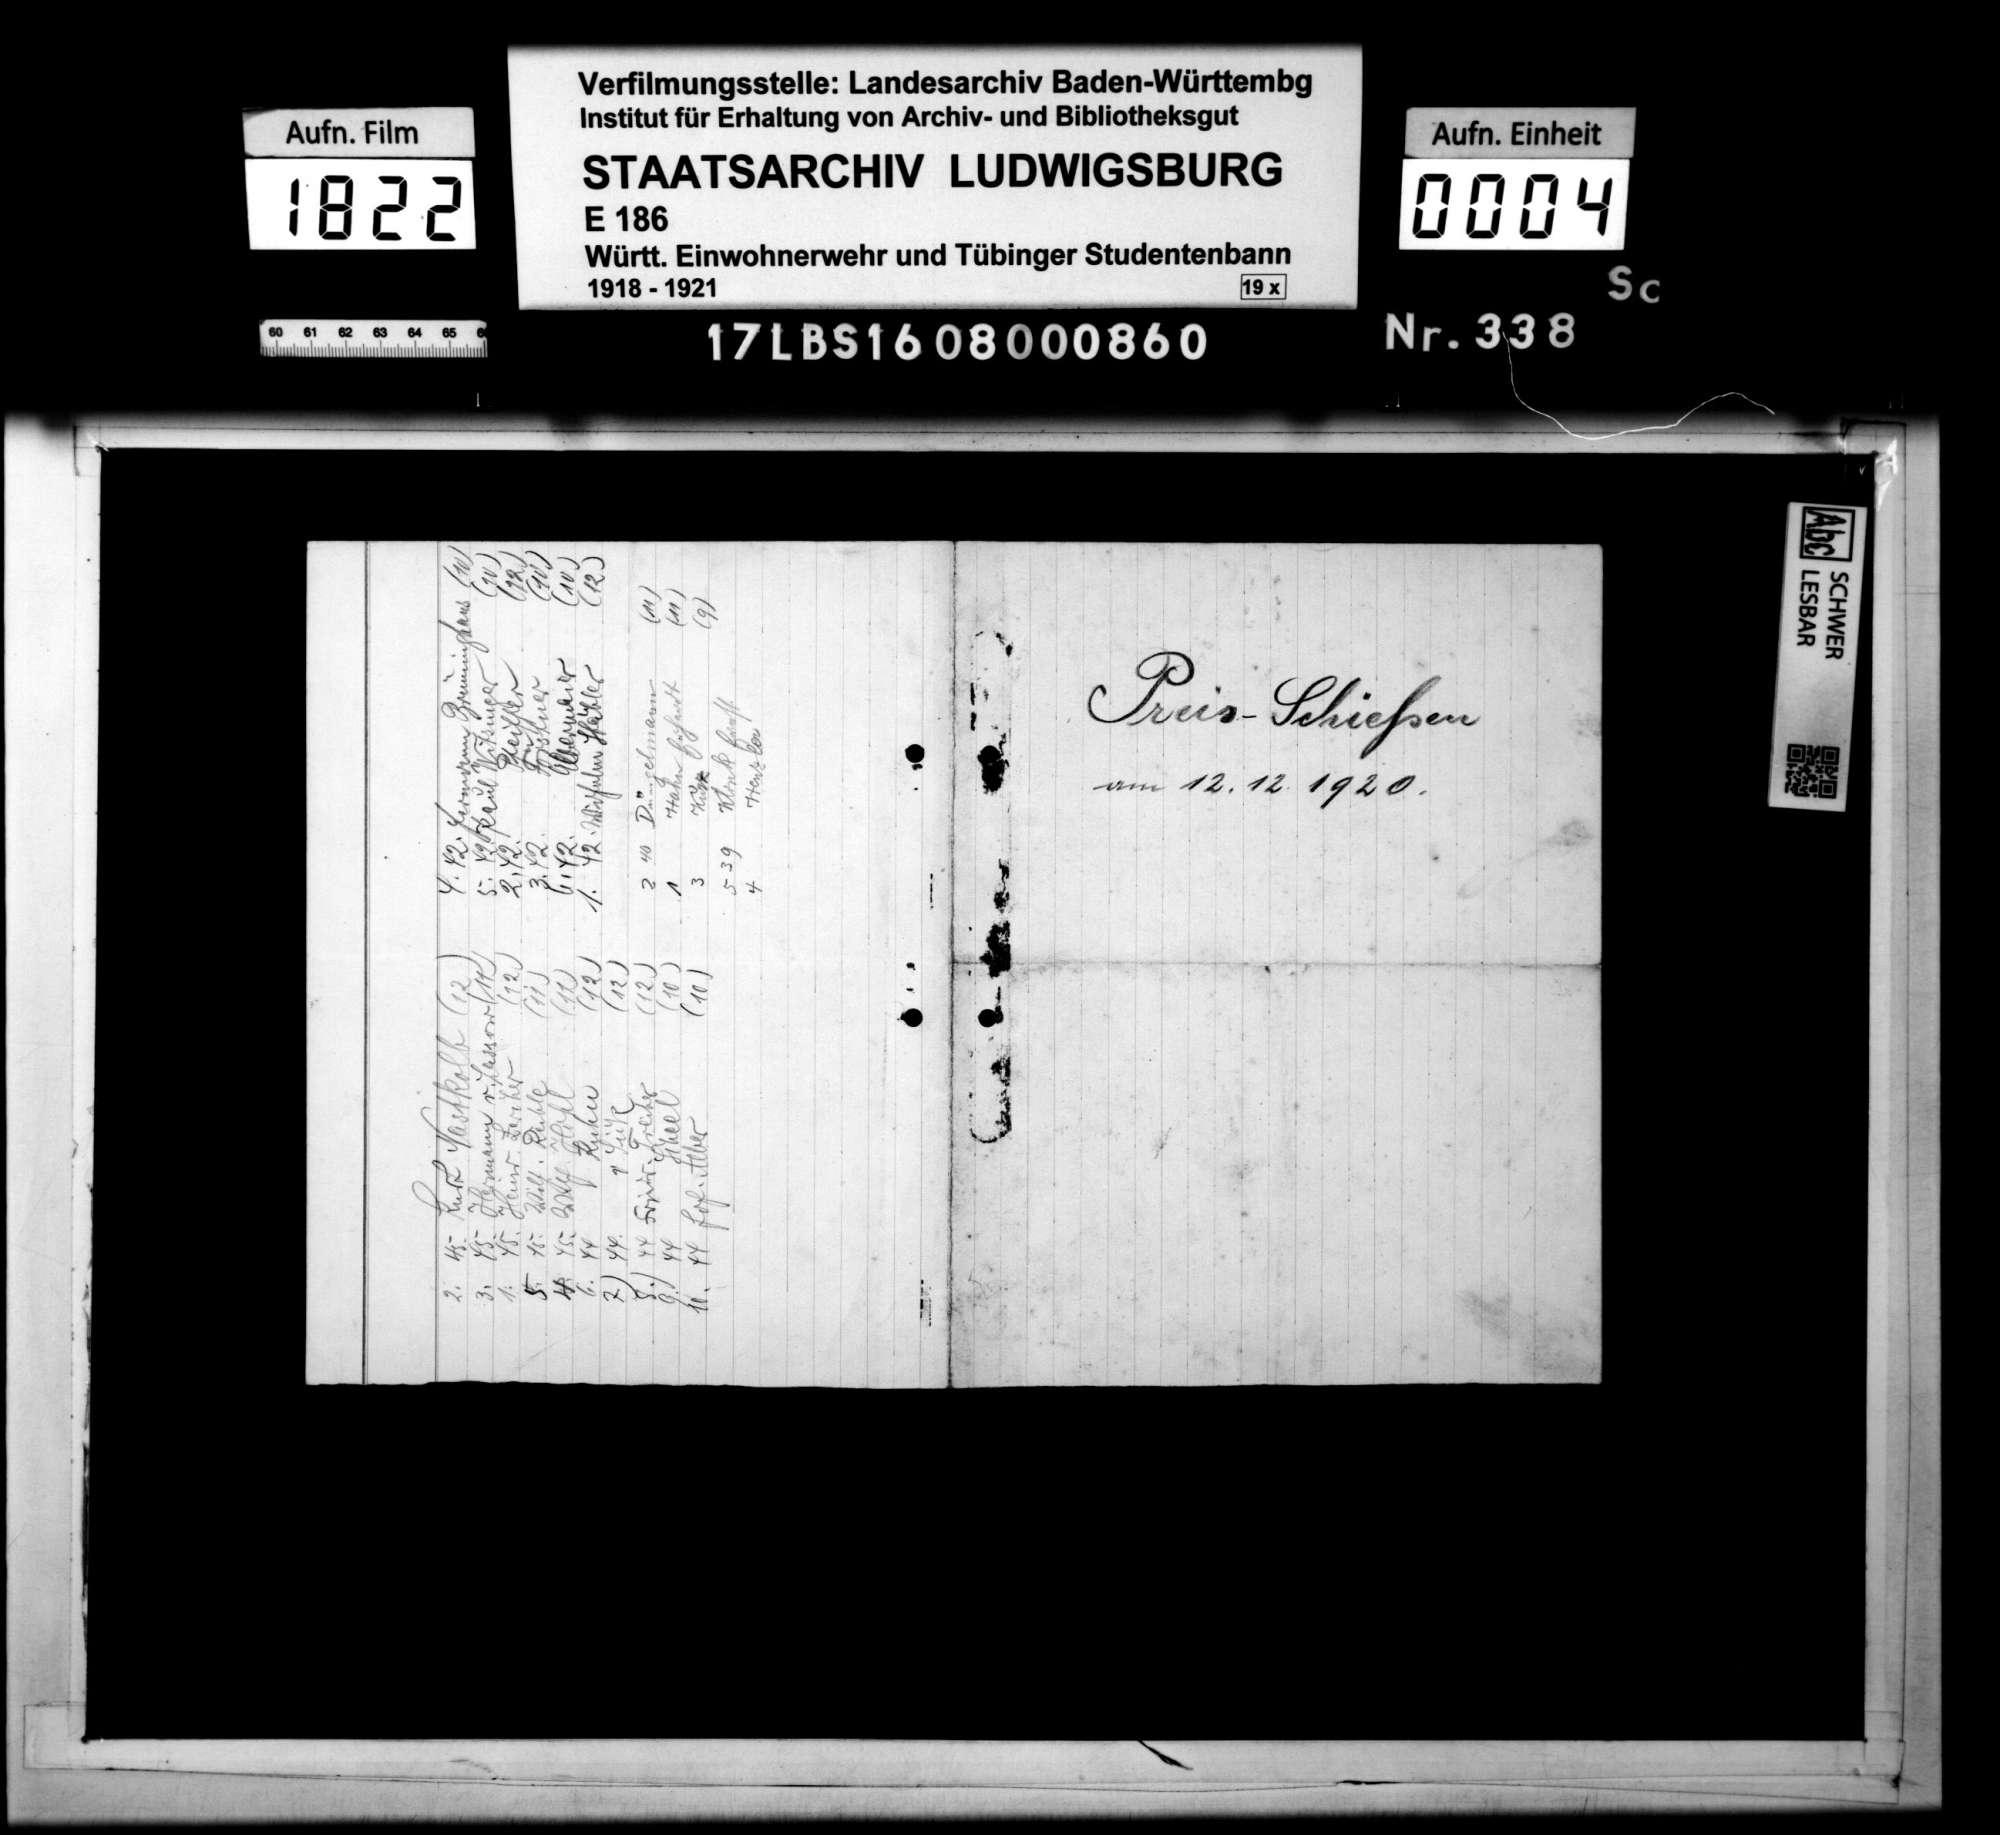 Preisschießen am 12.12.1920: Namenslisten, Bild 2